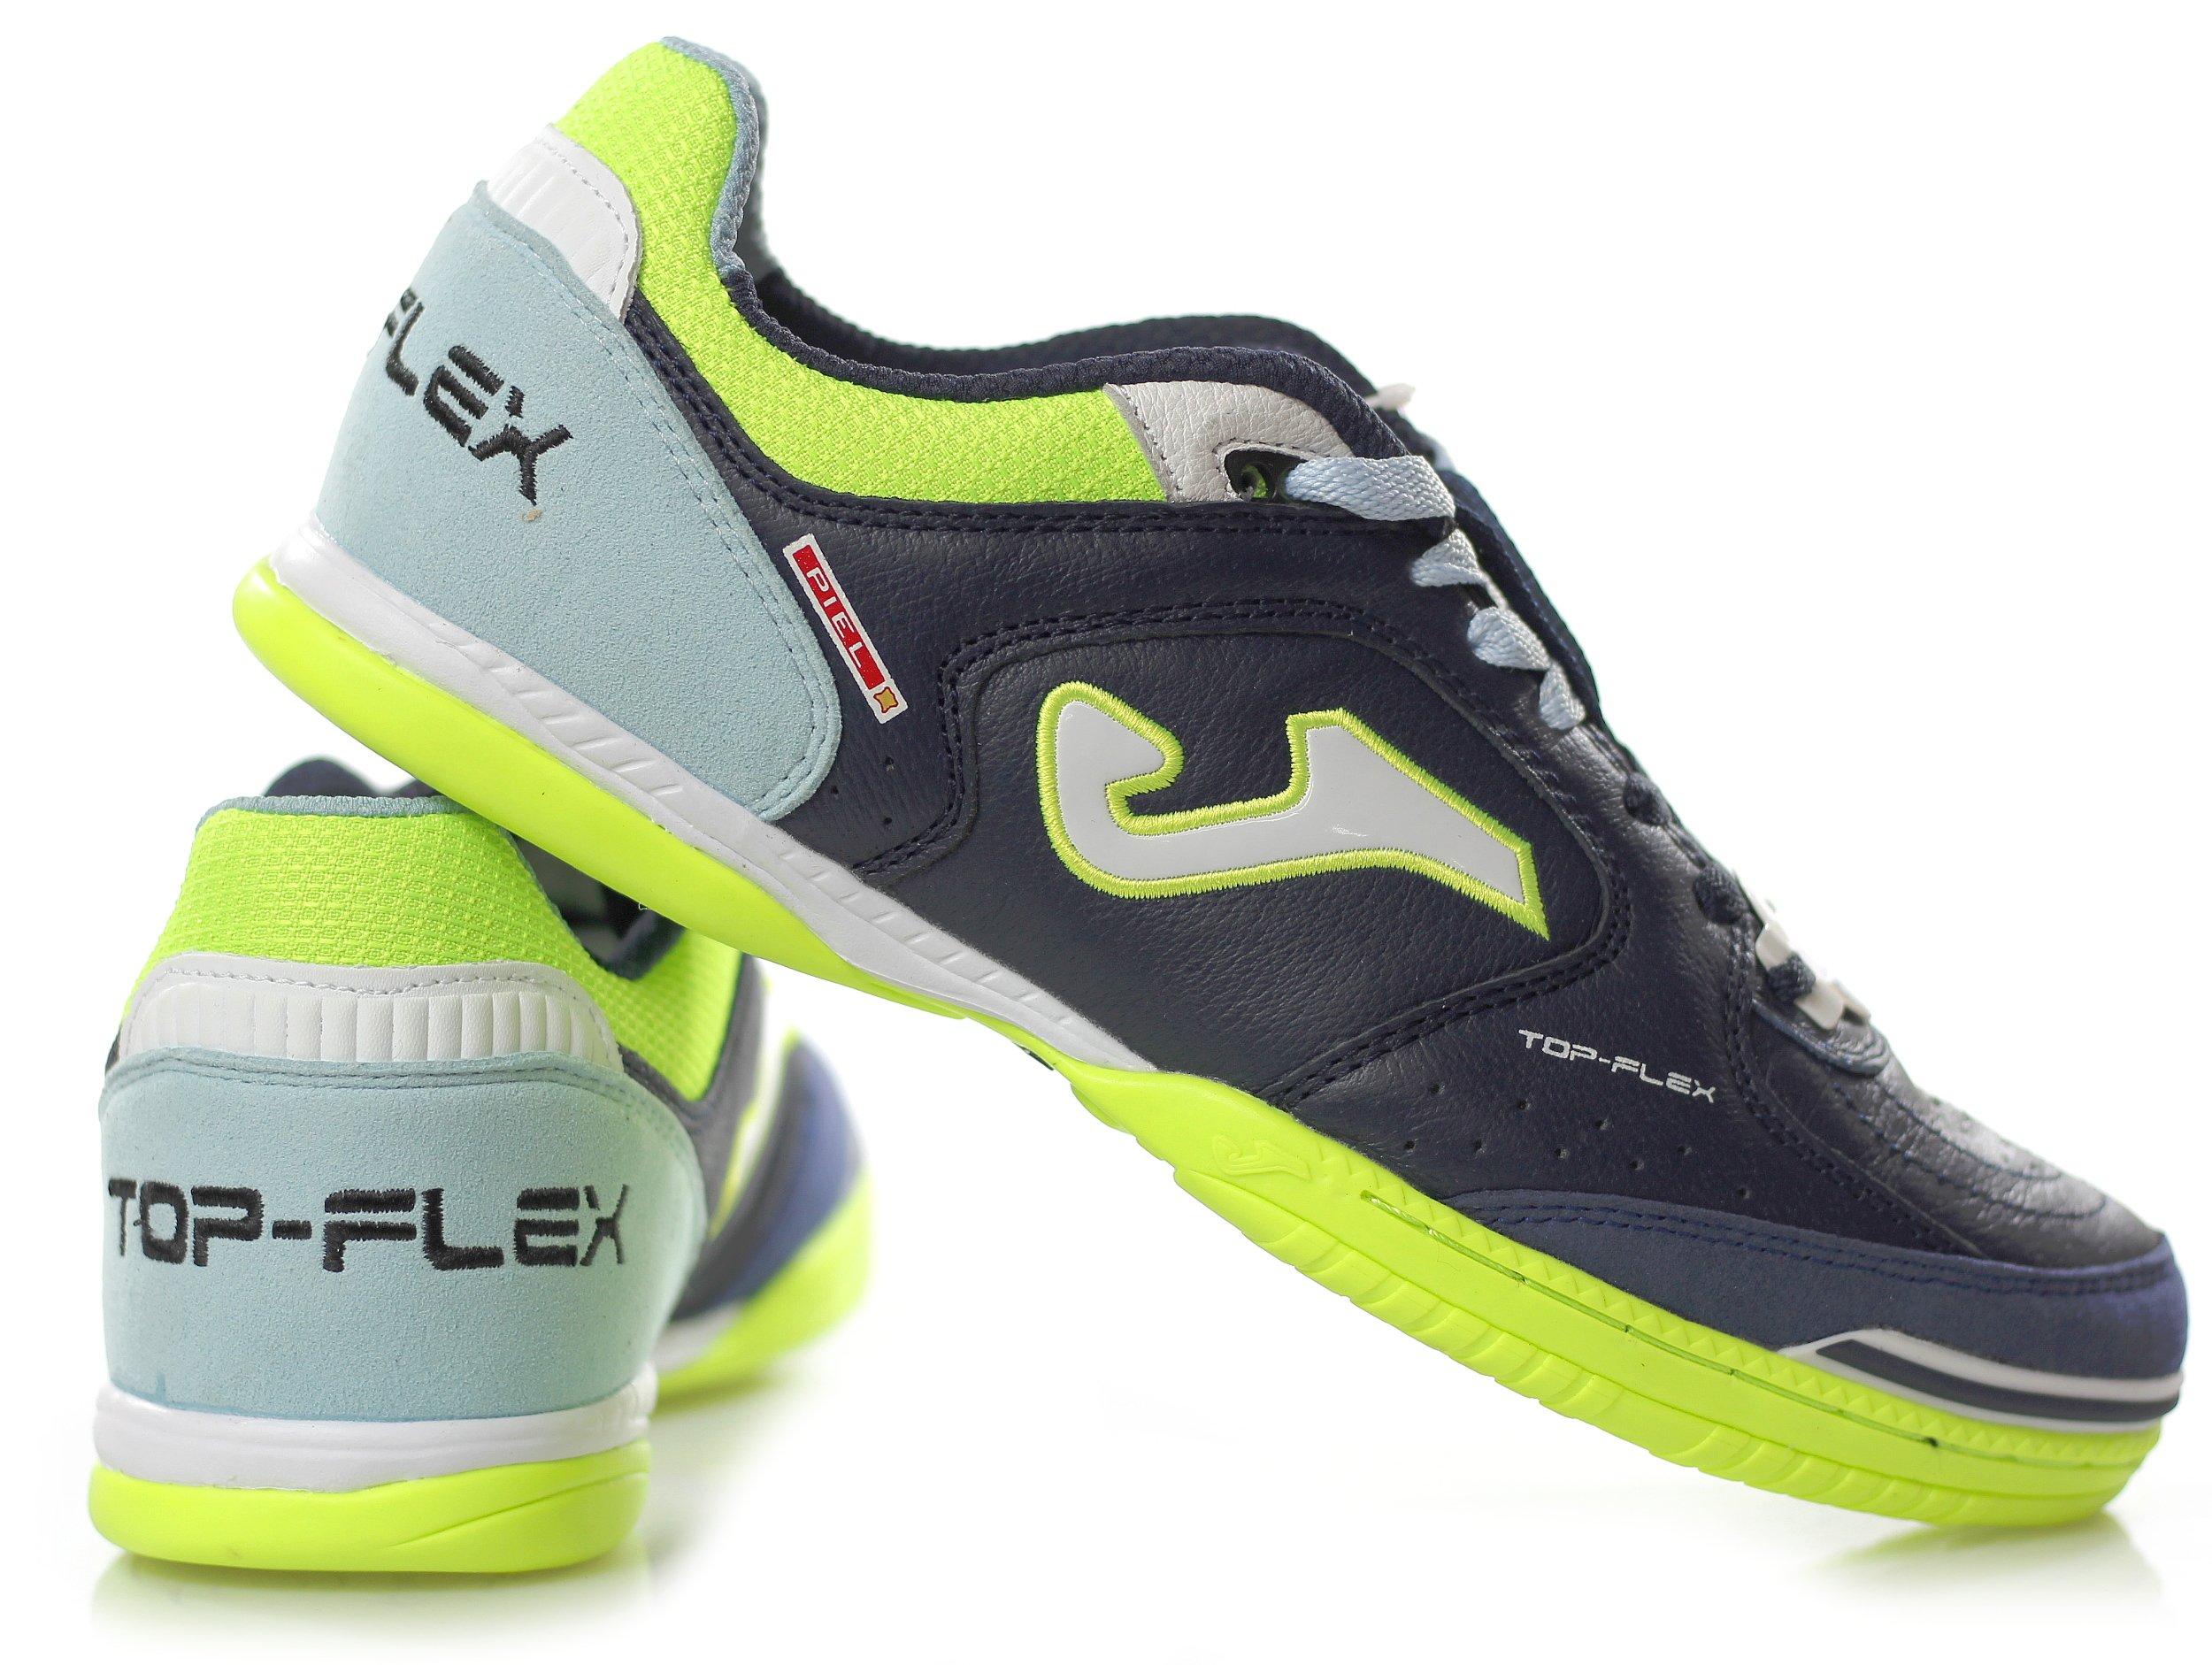 Buty na halę JOMA TOP FLEX 703